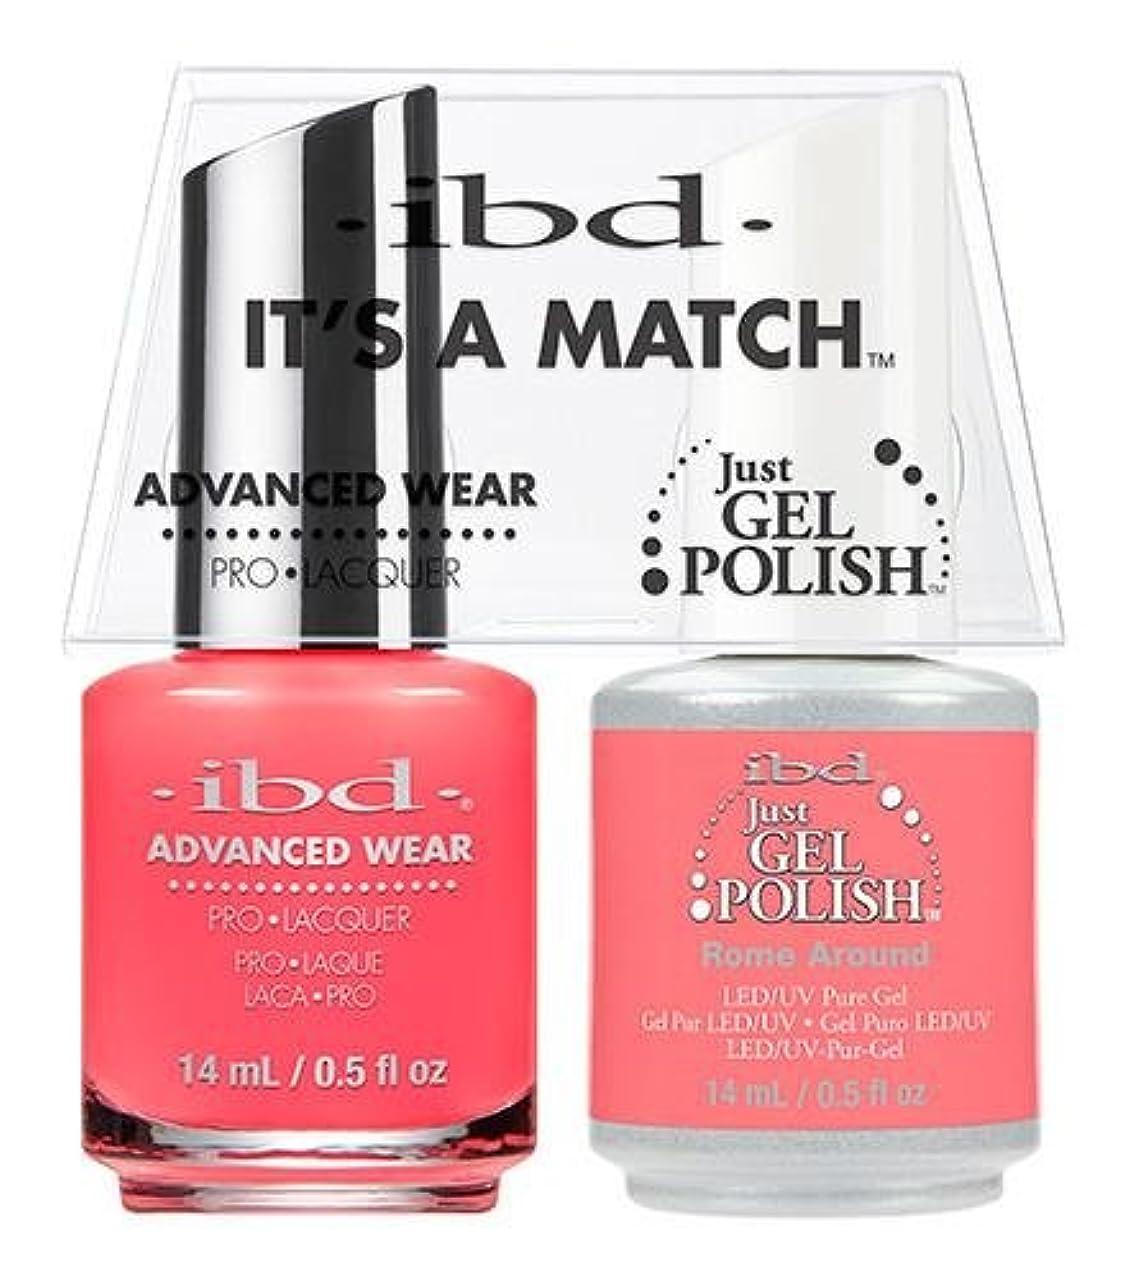 騒条約火山学IBD Advanced Wear -